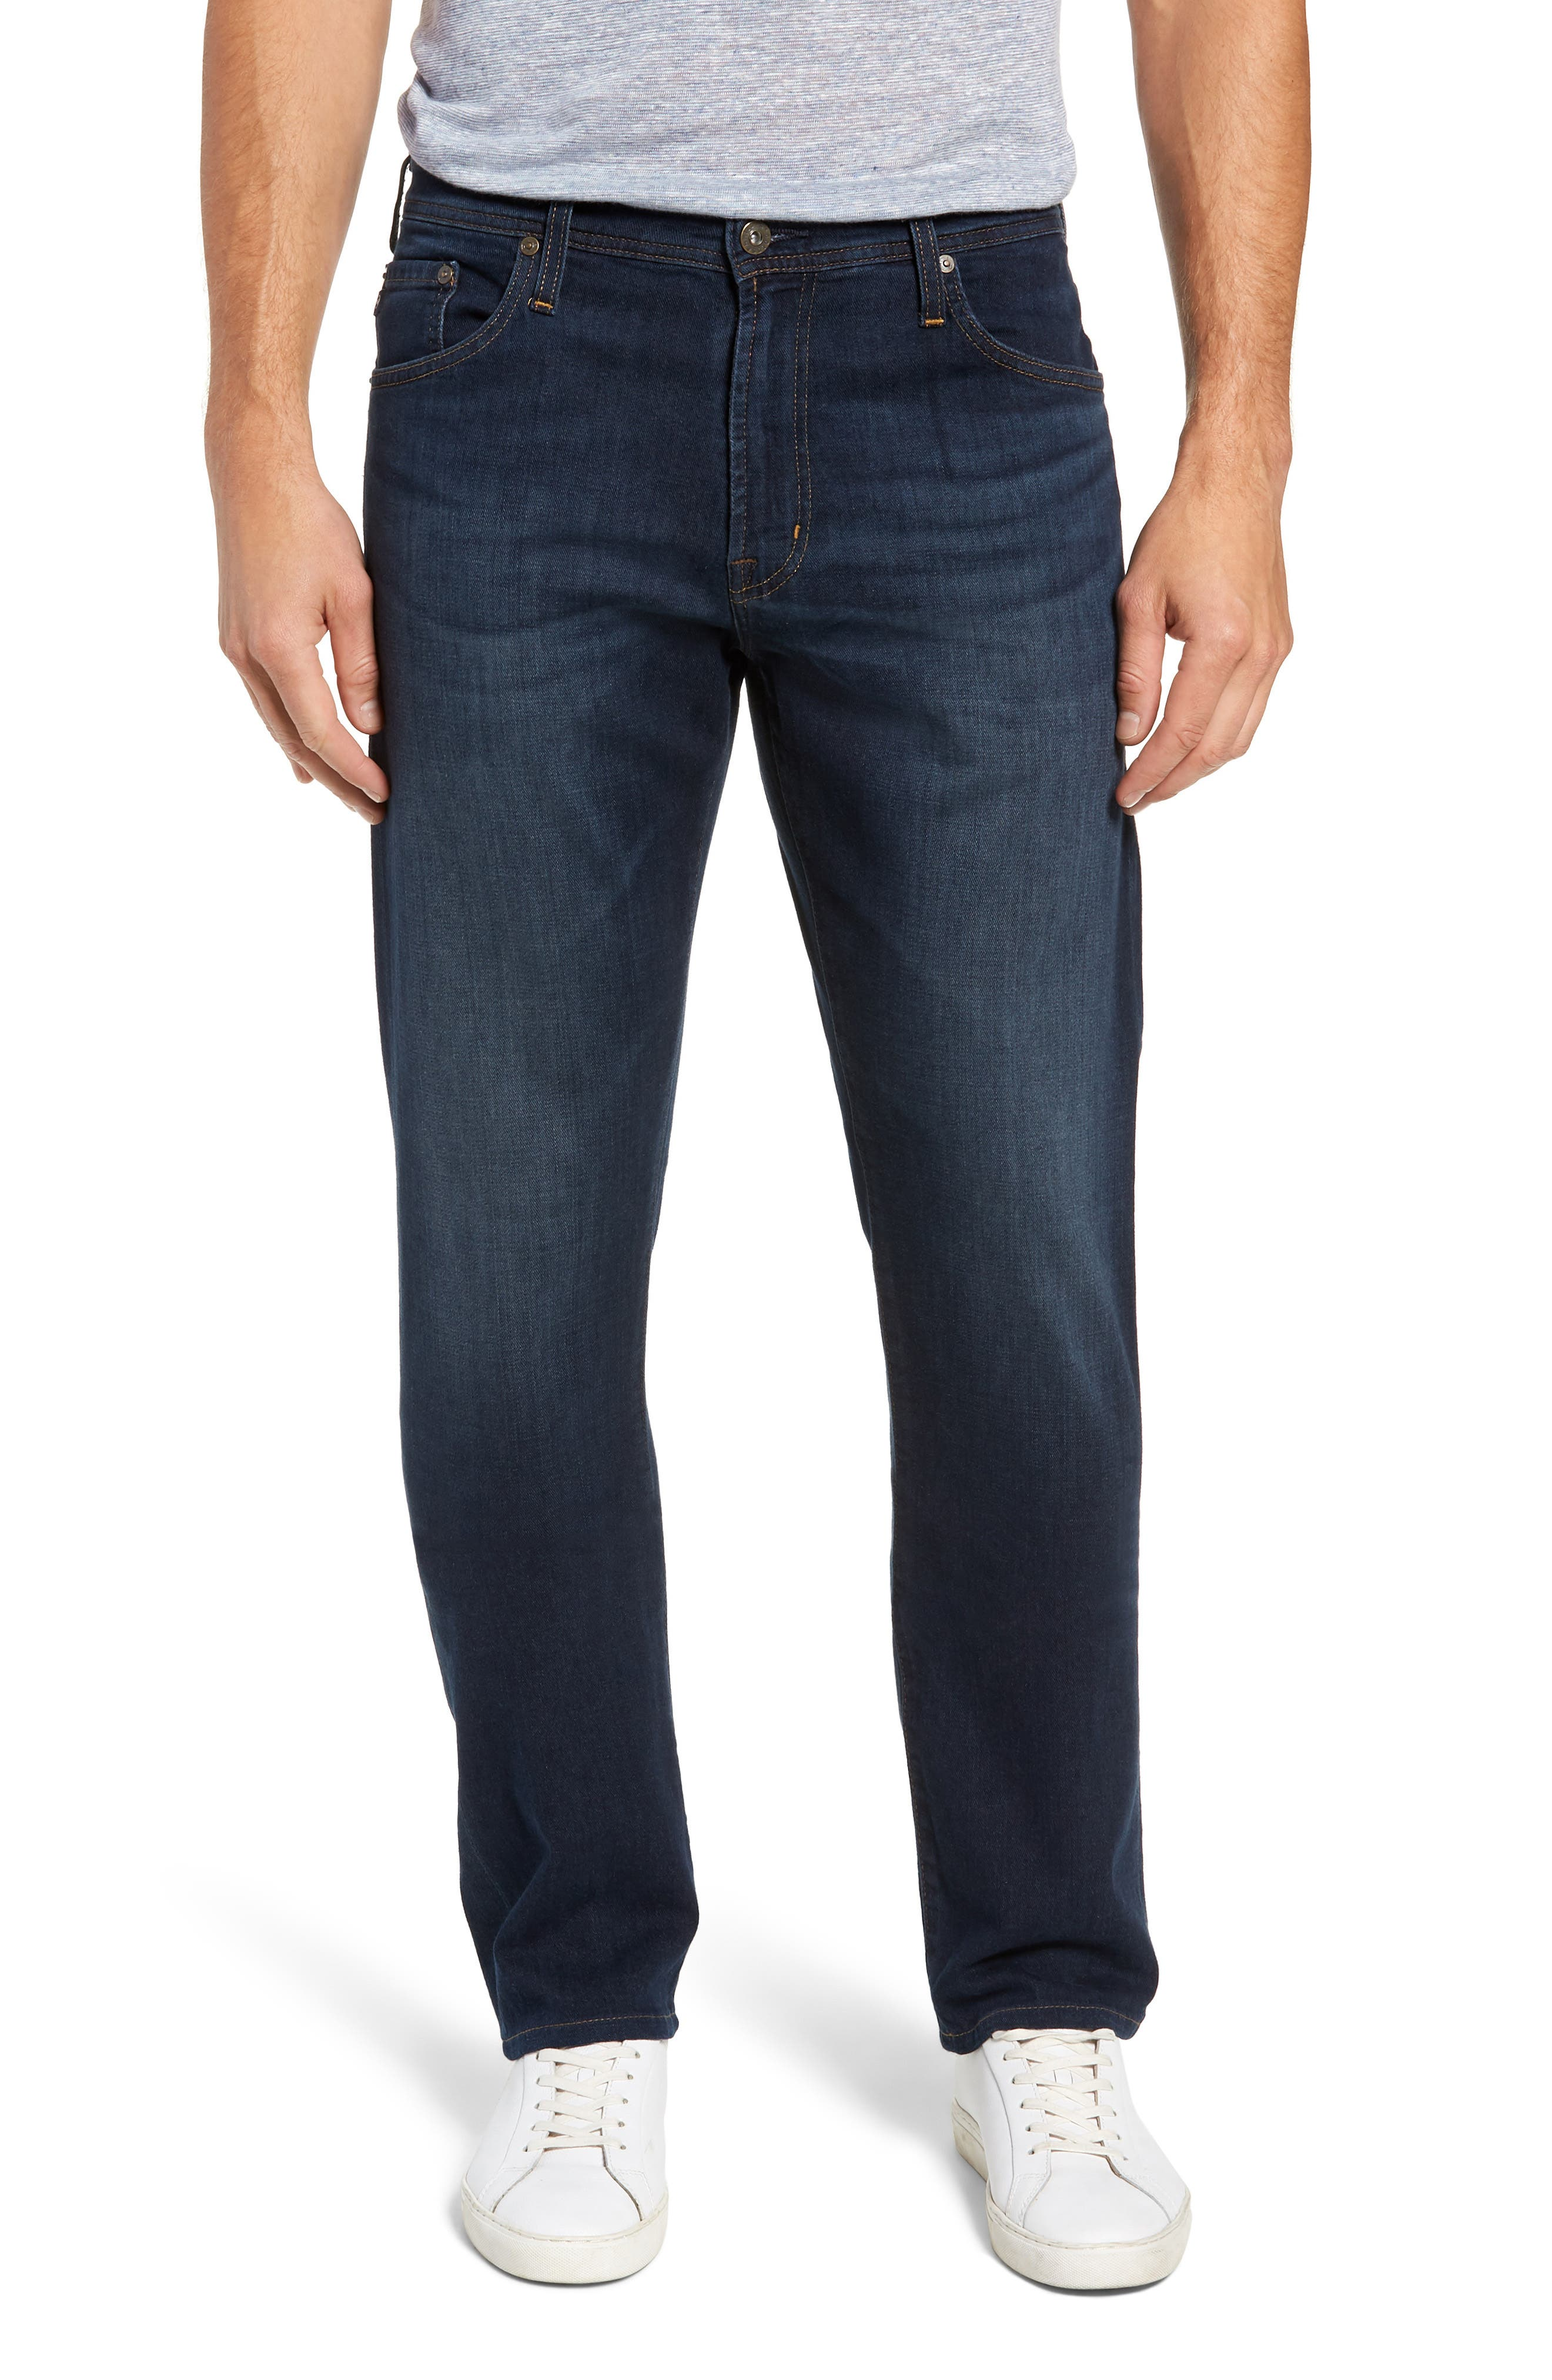 AG, Ives Straight Leg Jeans, Main thumbnail 1, color, COVET